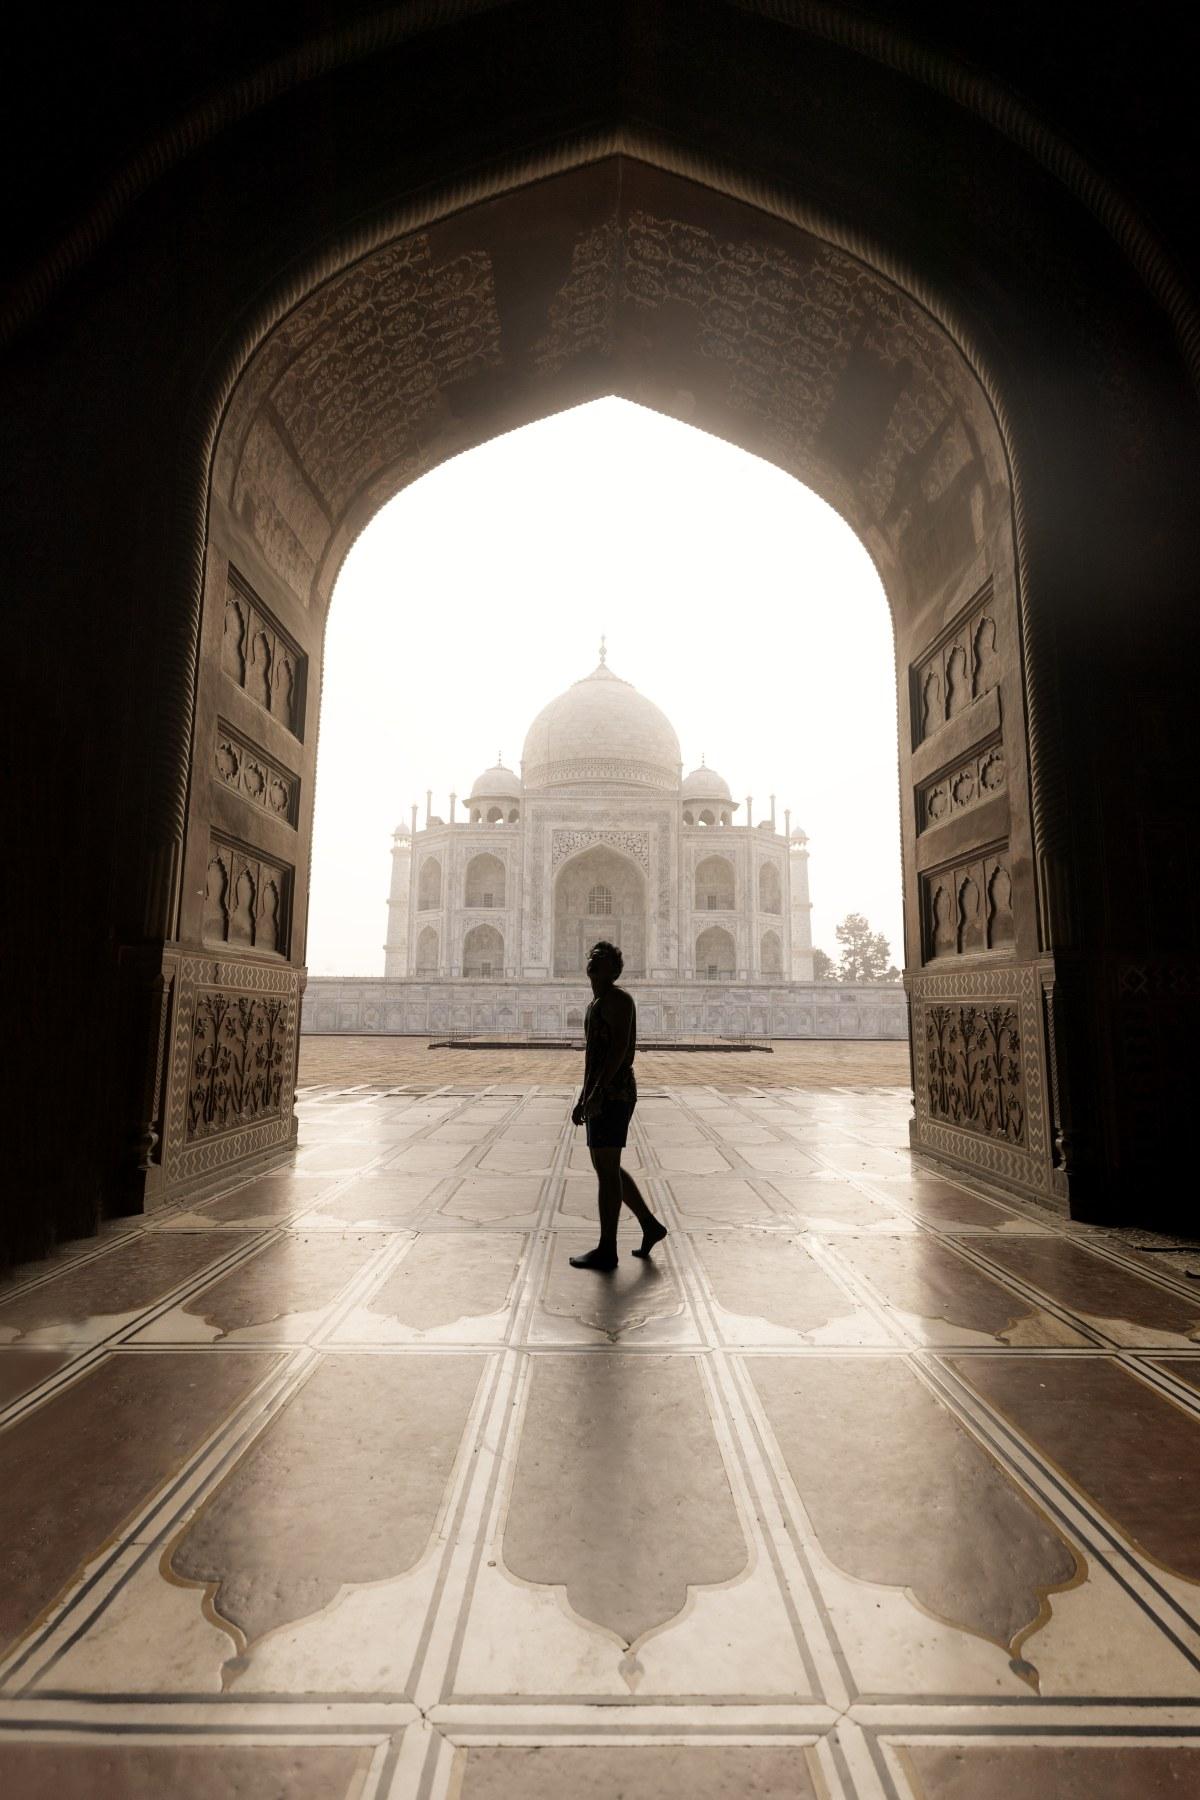 Taj view from Masjid by the side of it.